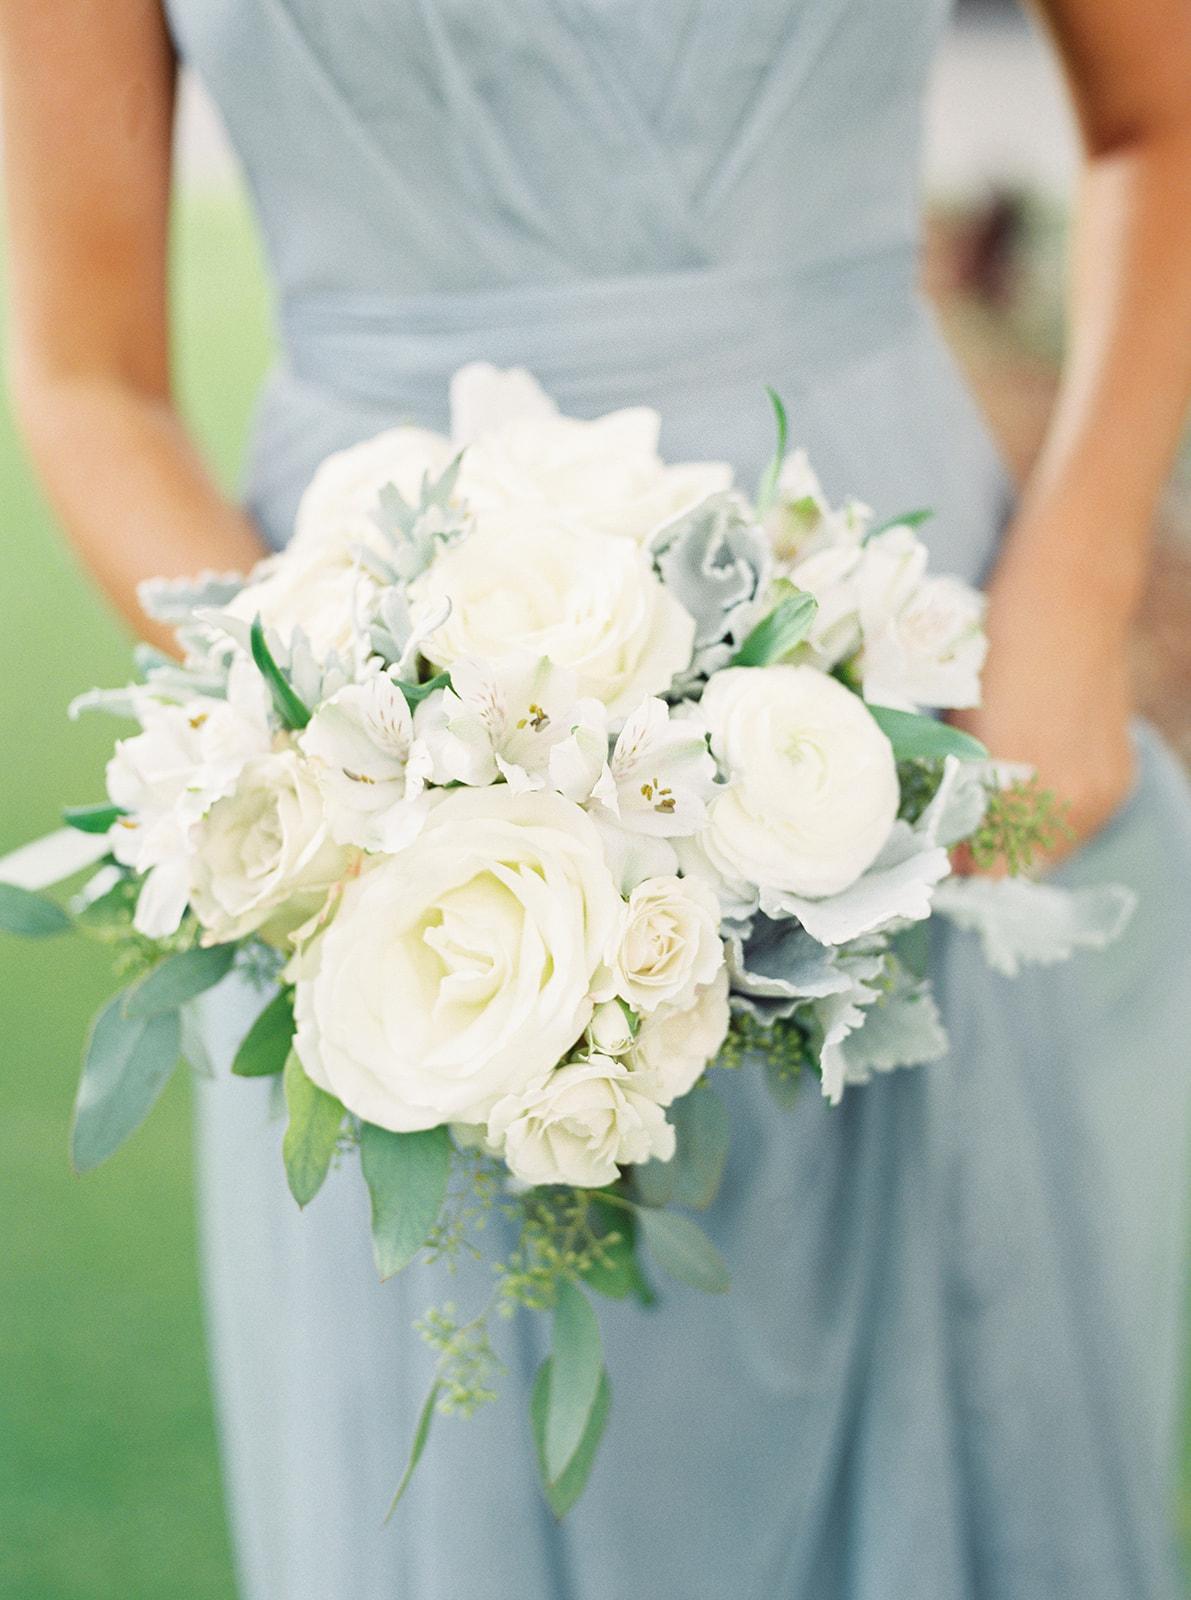 Bridal bouquet, bridesmaid bouquet, all white bouquet | Birmingham, Alabama wedding | Taylor Dane Photography | Custom wedding invitations by Little Fox Paperie | Gracie Nunez